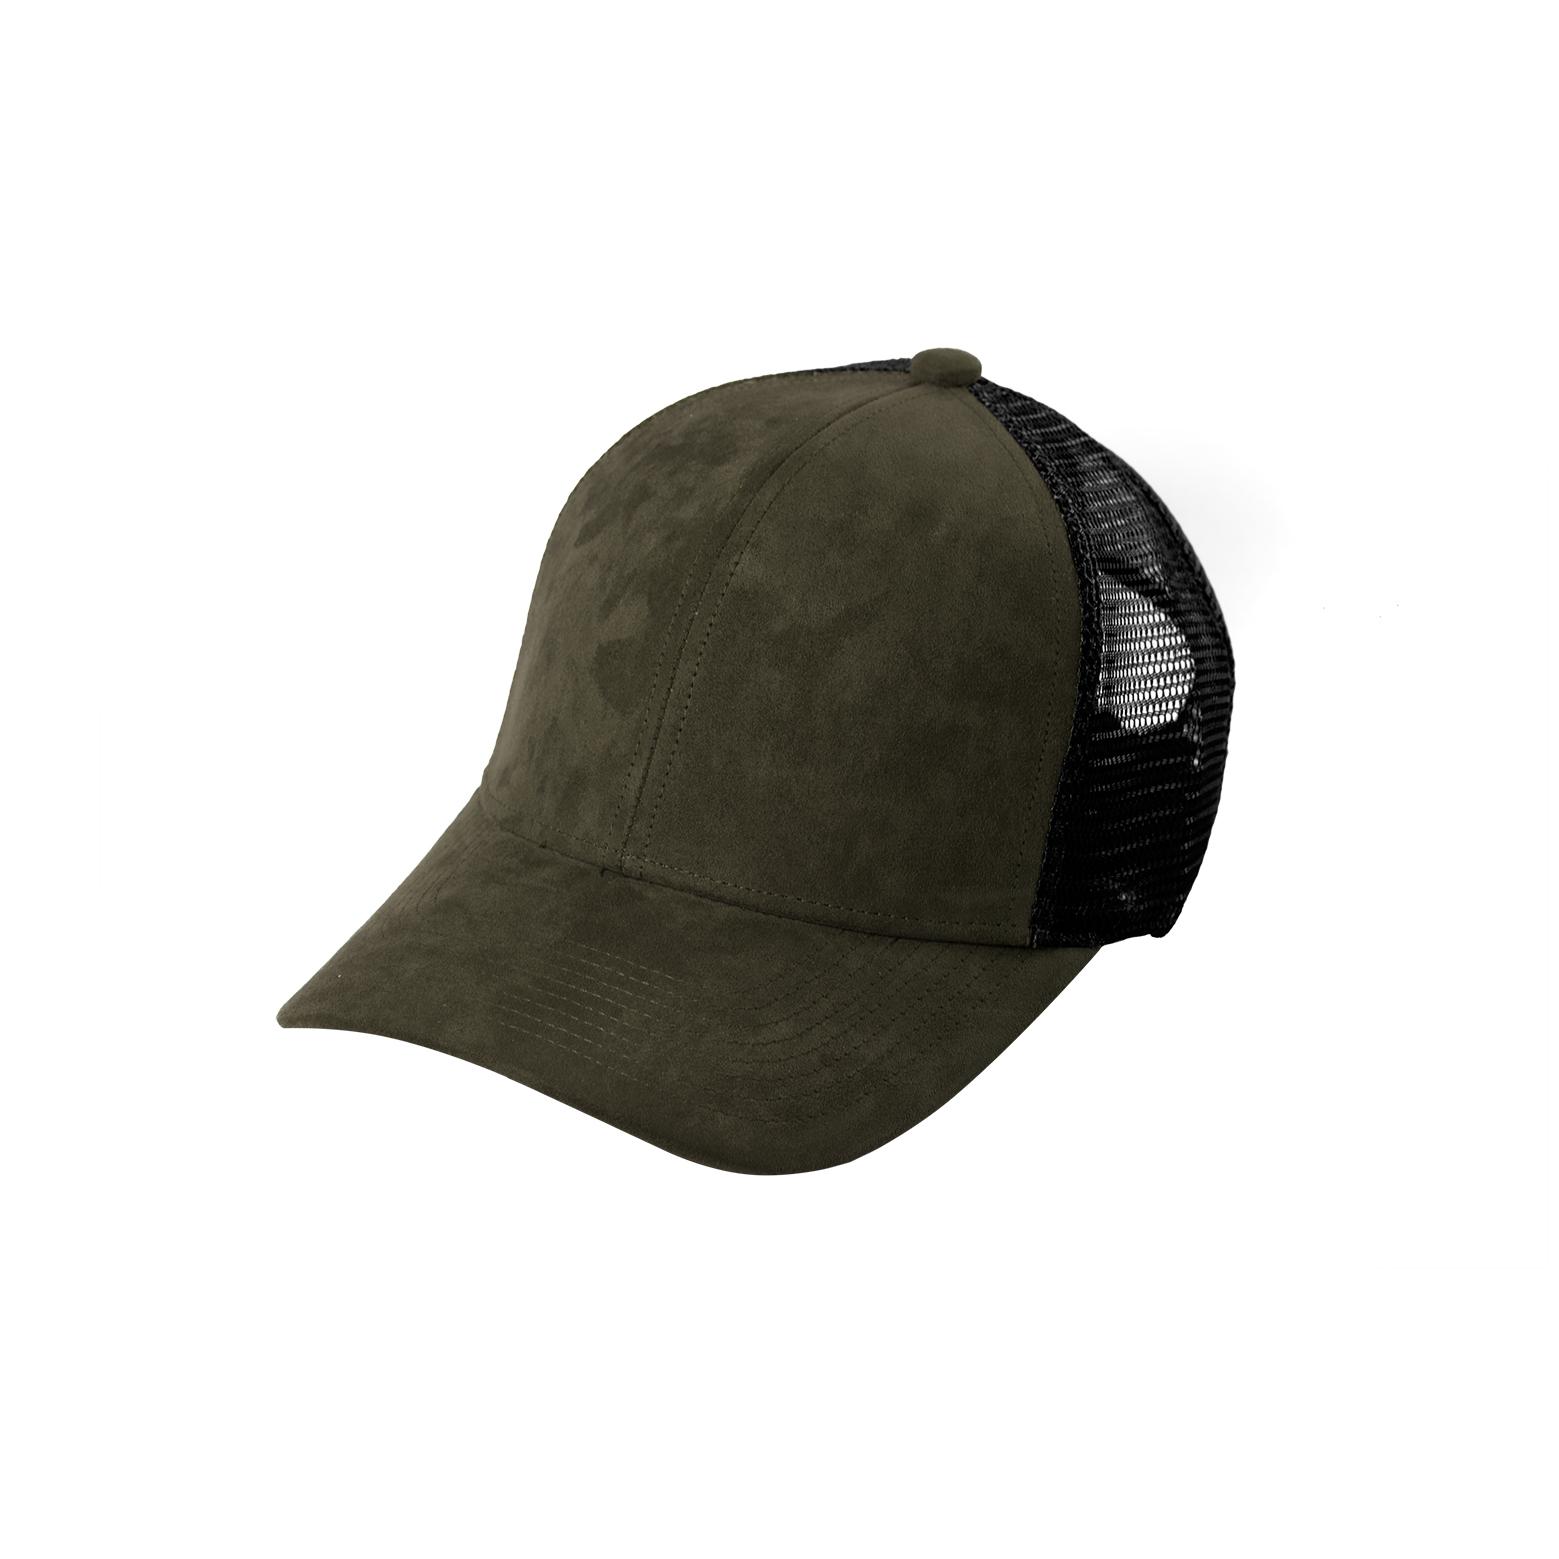 TRUCKER CAP OLIVE SUEDE FRONT SIDE